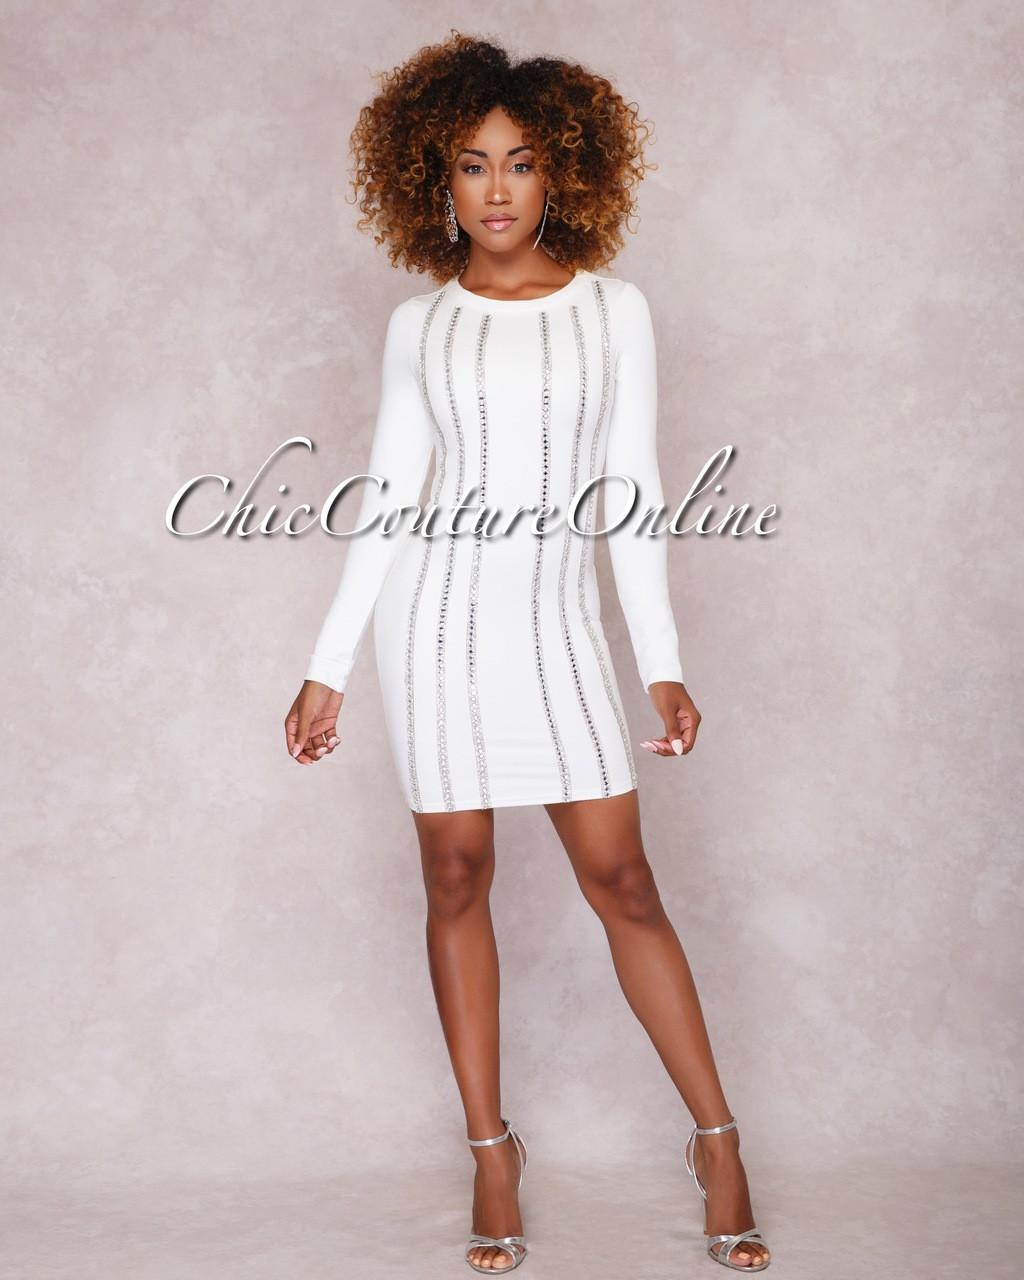 f2bc6a3bb00 Imani White Rhinestone Embellished Mini Dress. Price   70.00. Image 1.  Larger   More Photos